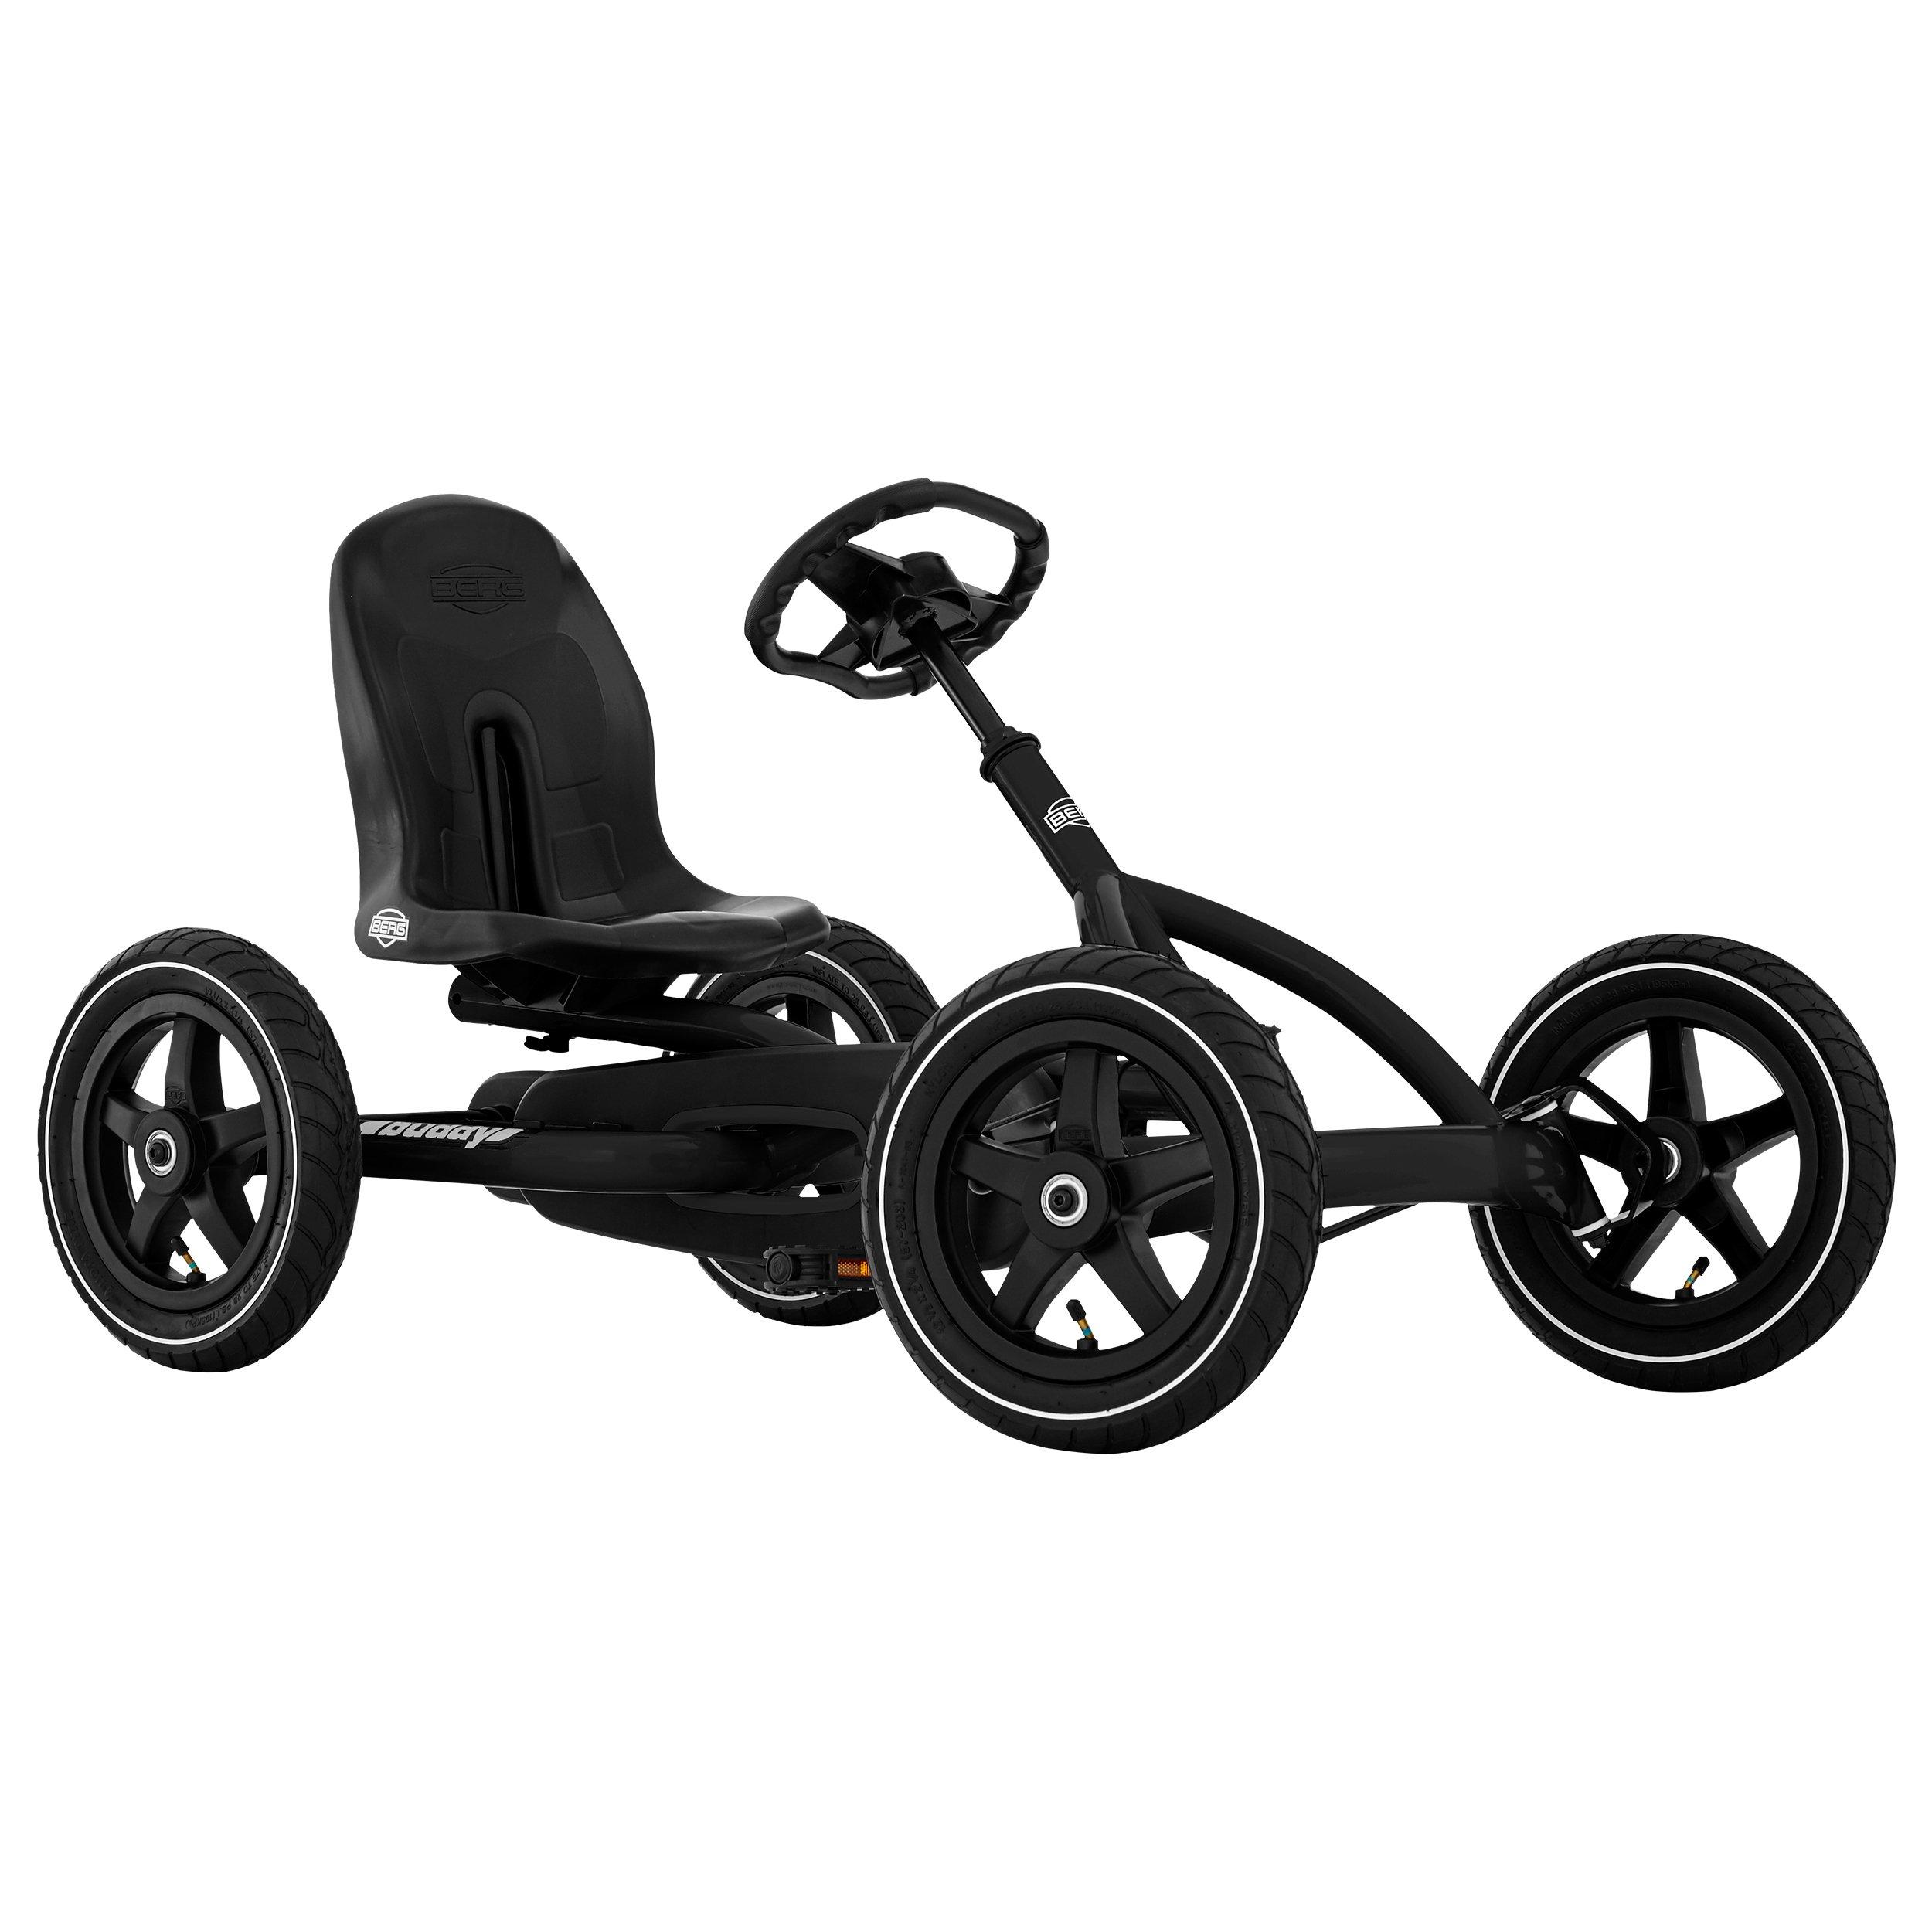 Berg Buddy Pedal Go Kart - Black Edition